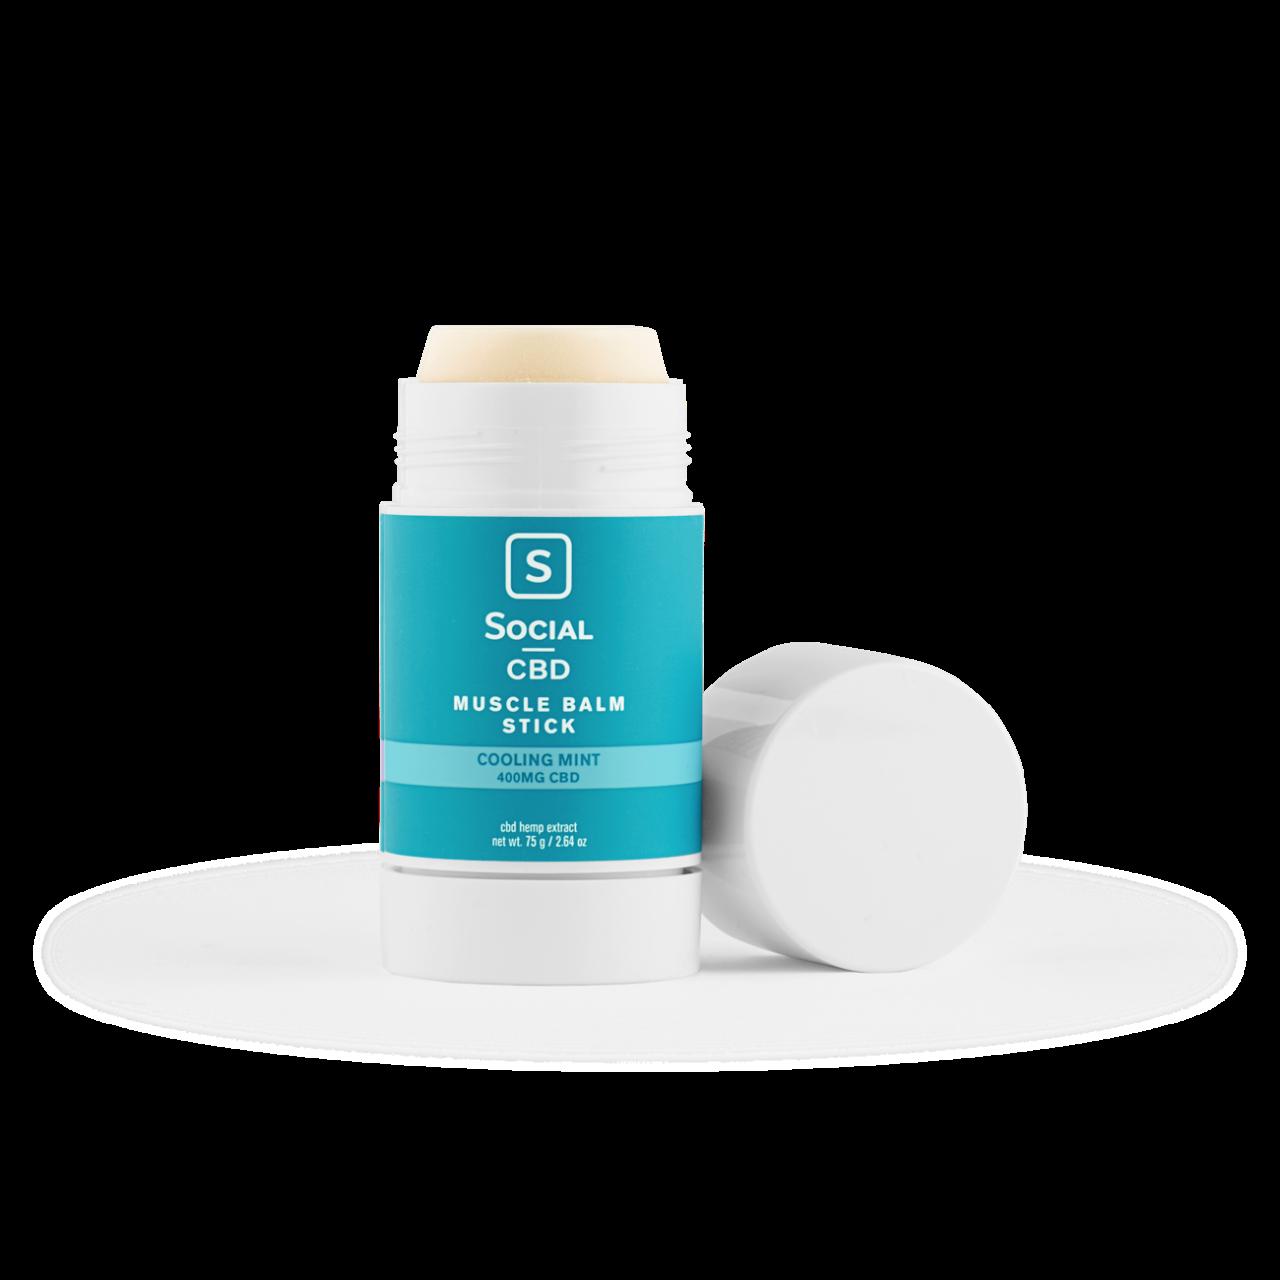 Social CBD, Cooling Mint CBD Muscle Balm Stick, Isolate THC-Free, 2.64oz, 400mg CBD 1